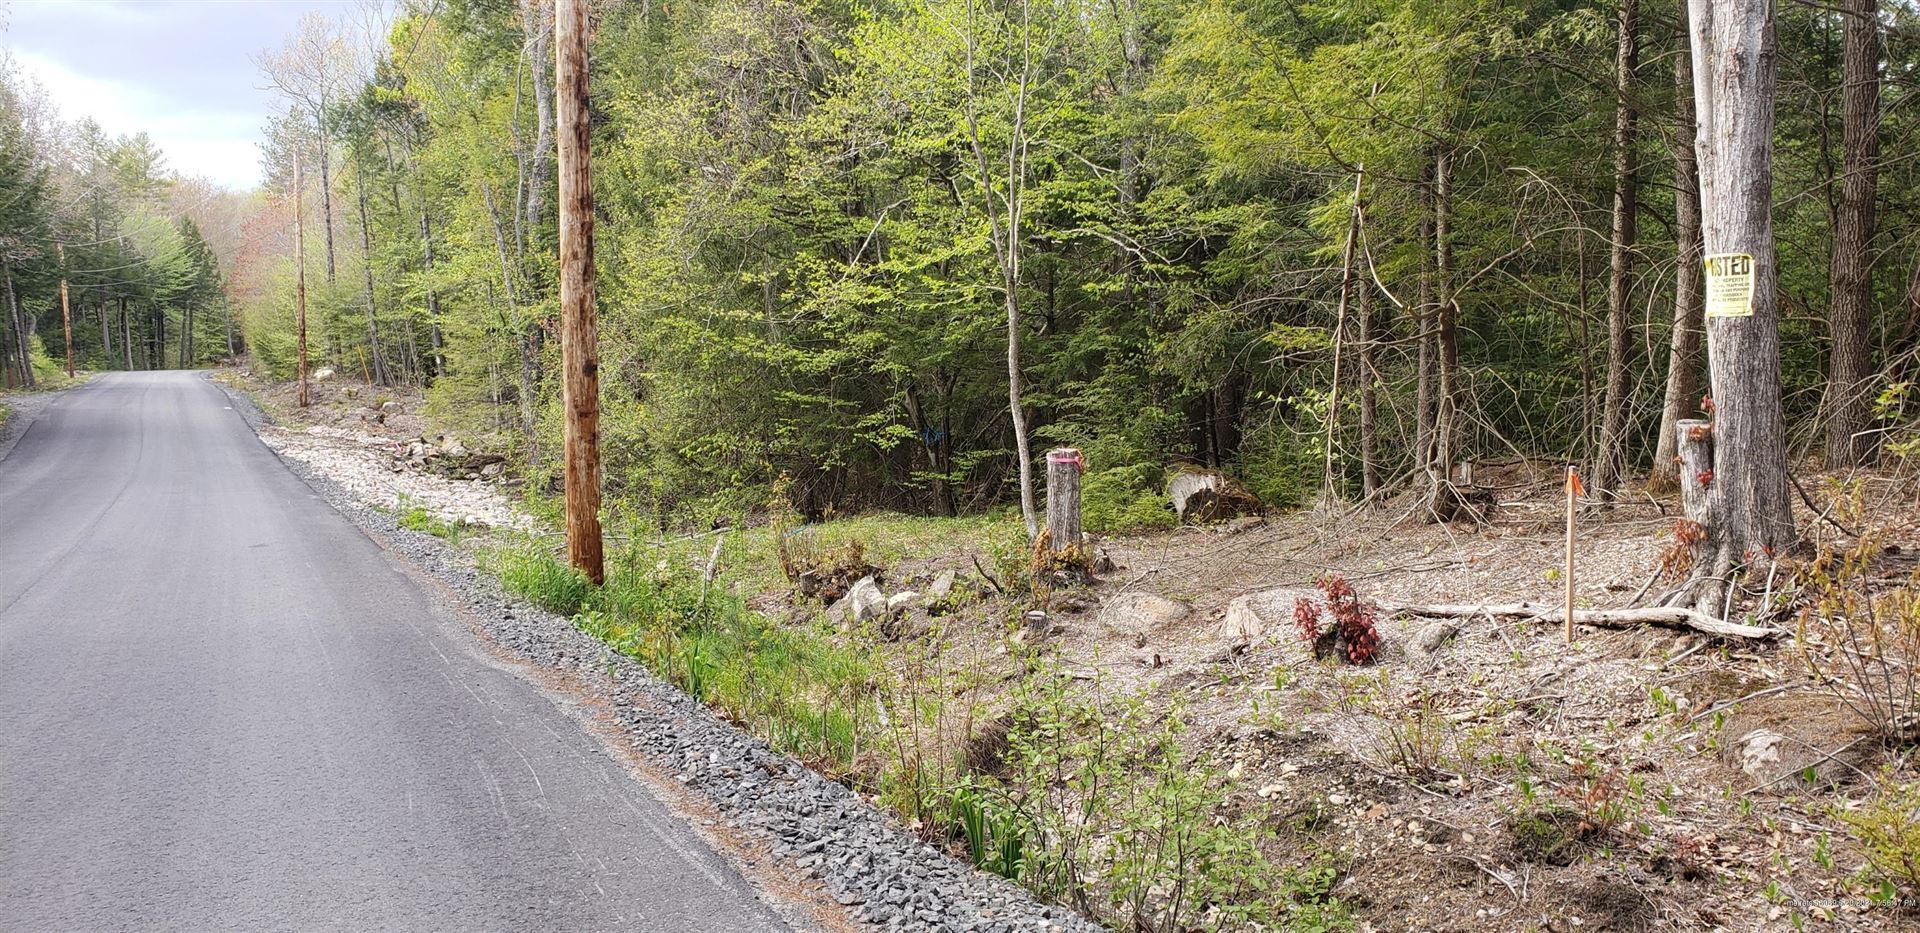 Photo of 75-4 Mountain Rd, South Berwick, ME 03908 (MLS # 1491394)